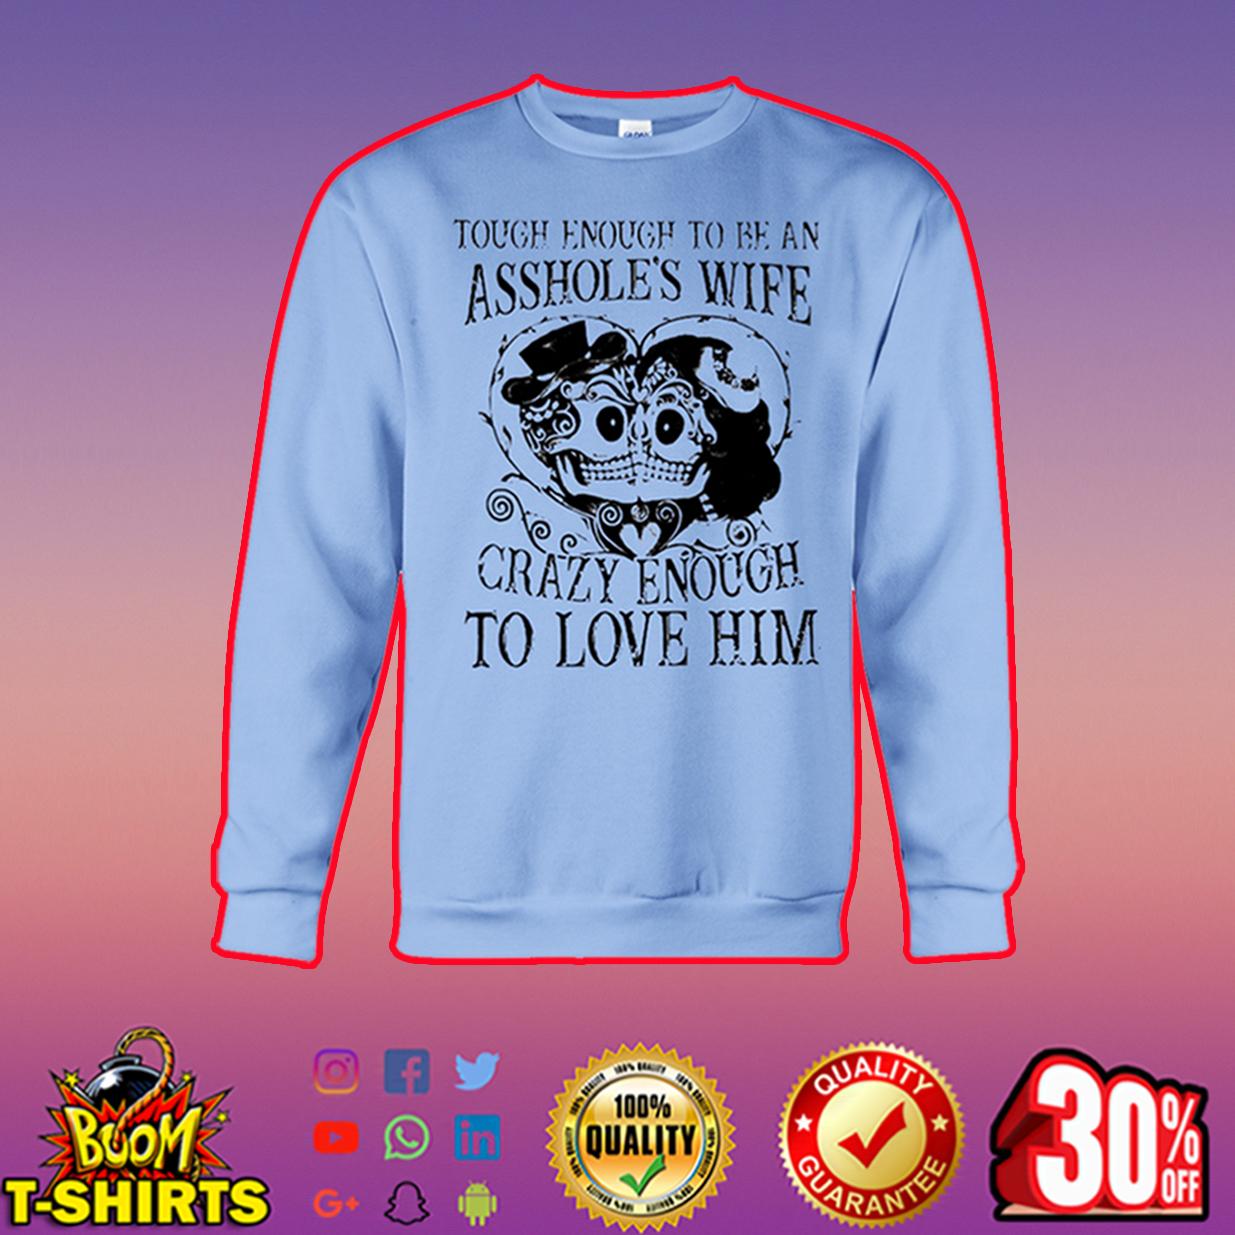 Tough enough to be an asshole's wife crazy enough to love him sweatshirt